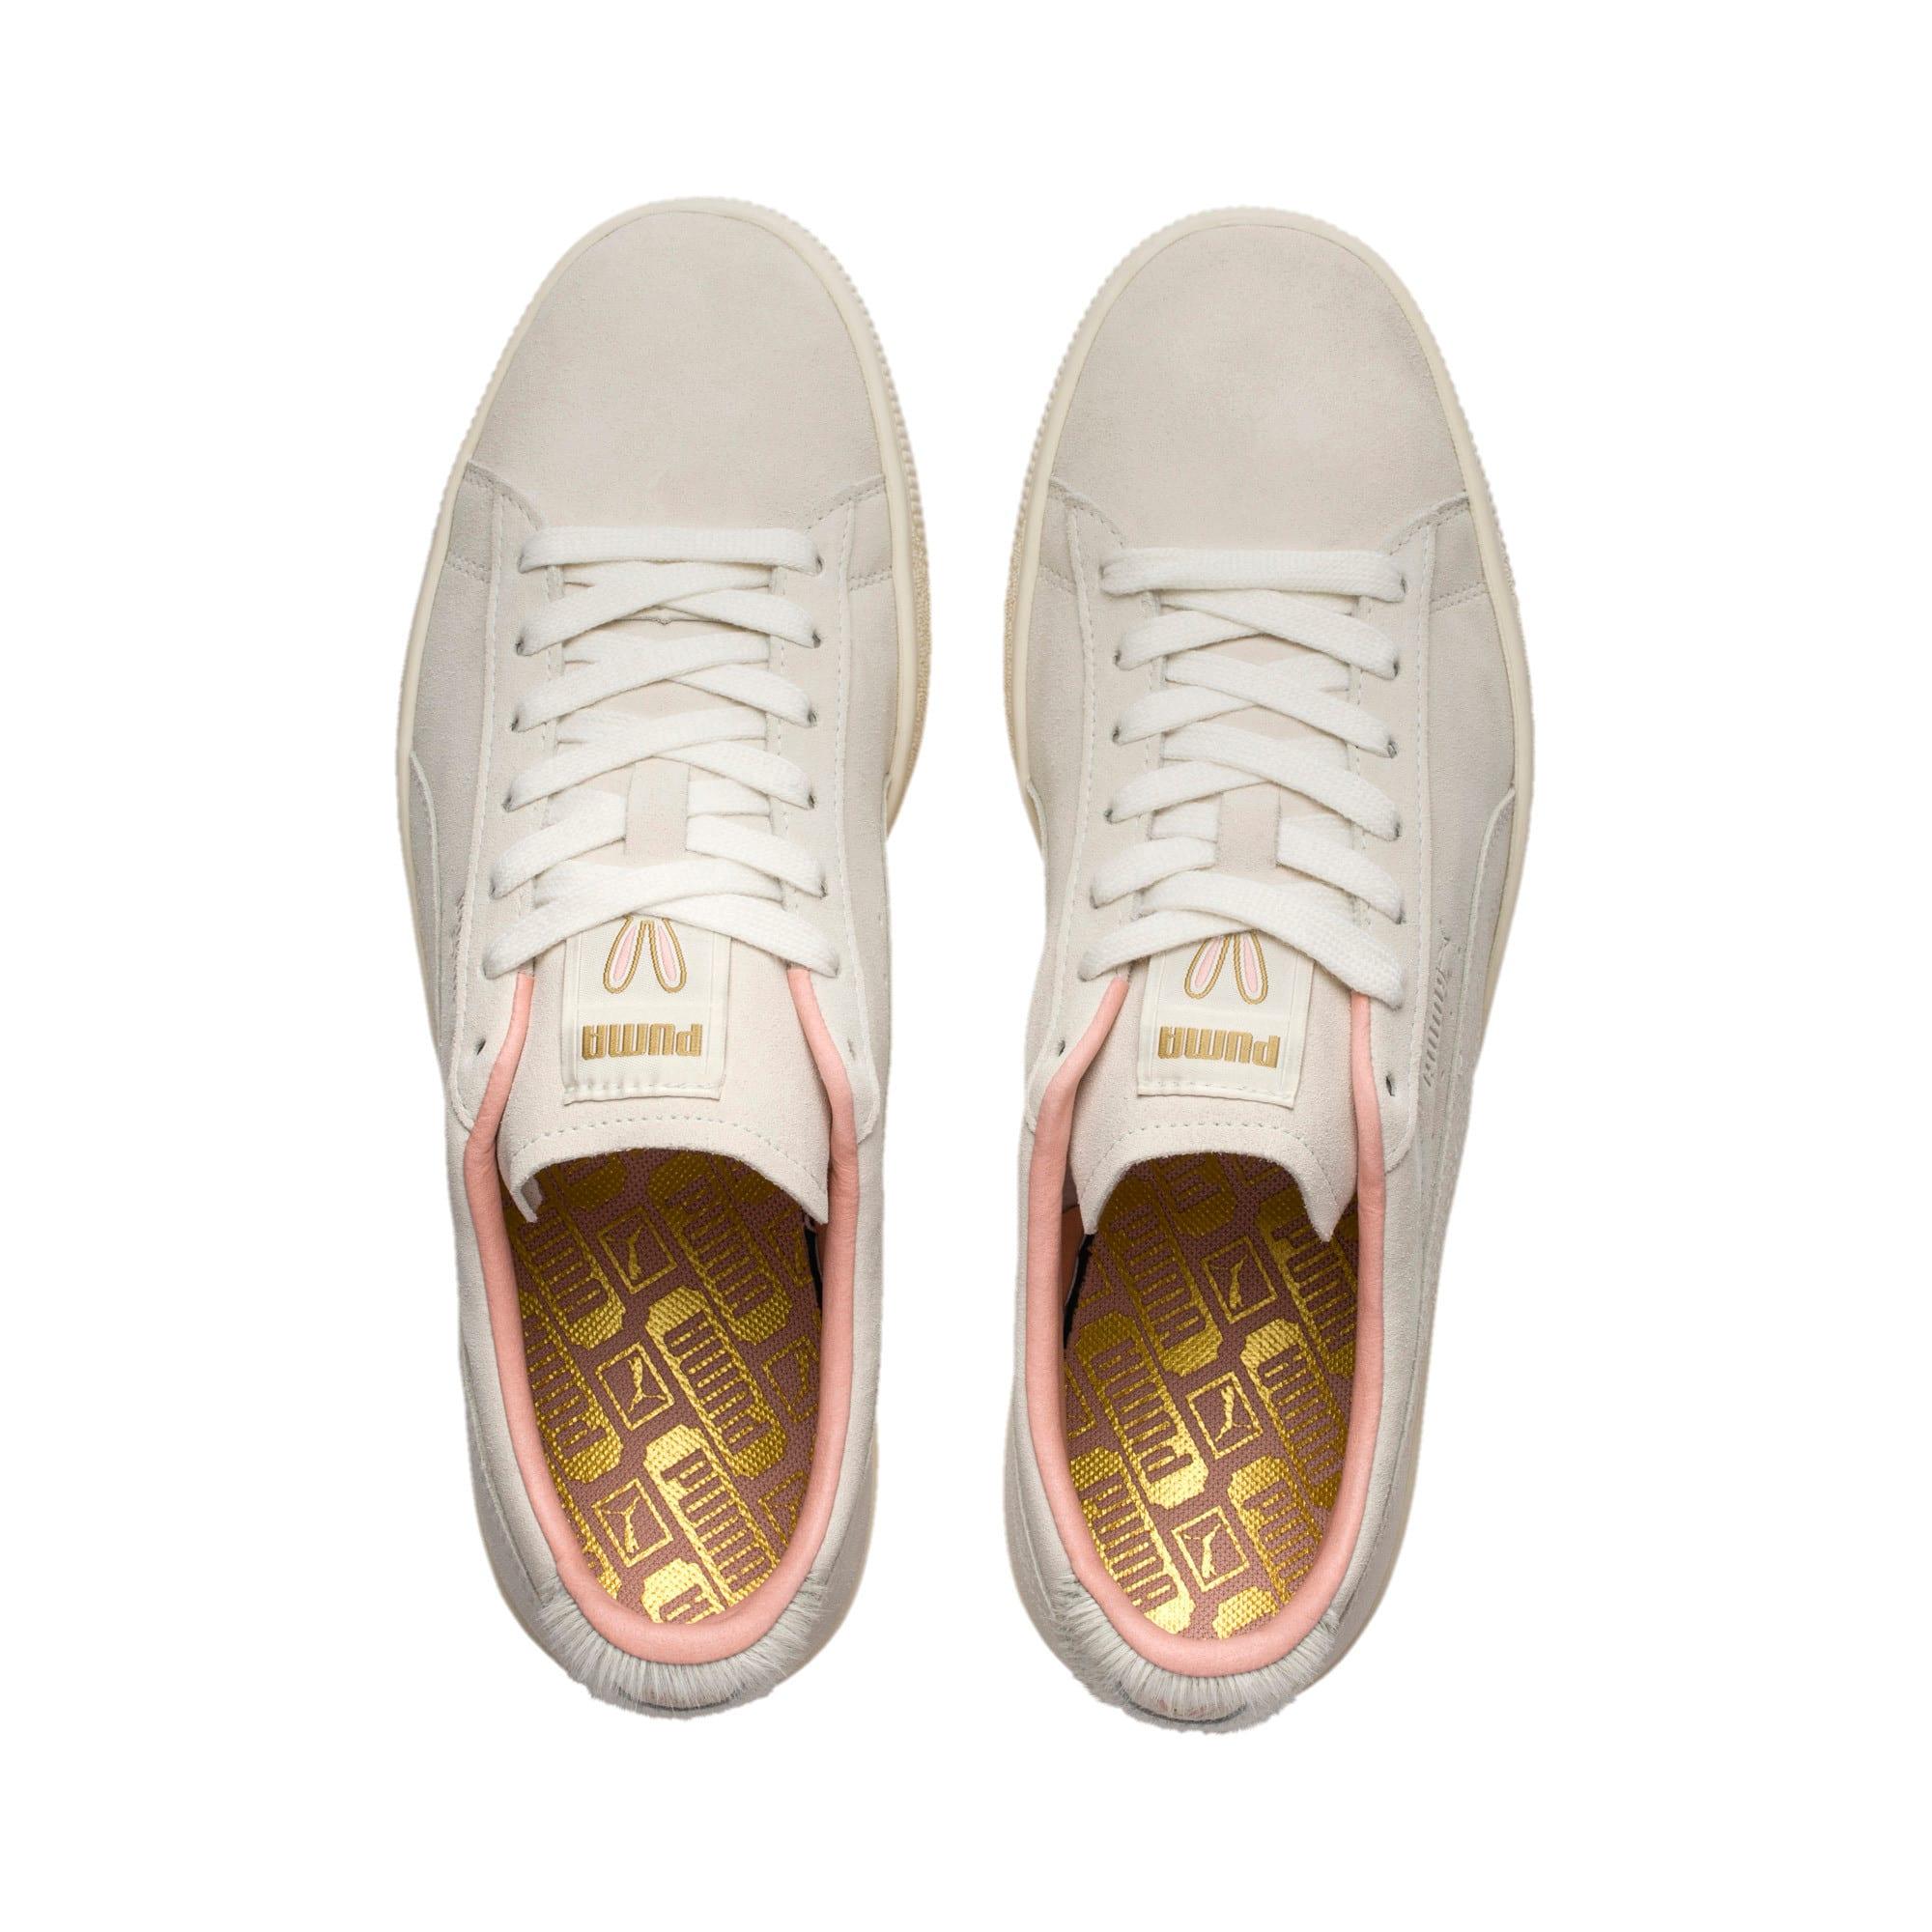 Thumbnail 6 of Suede Classic Easter Sneakers, Whisper White-Whisper White, medium